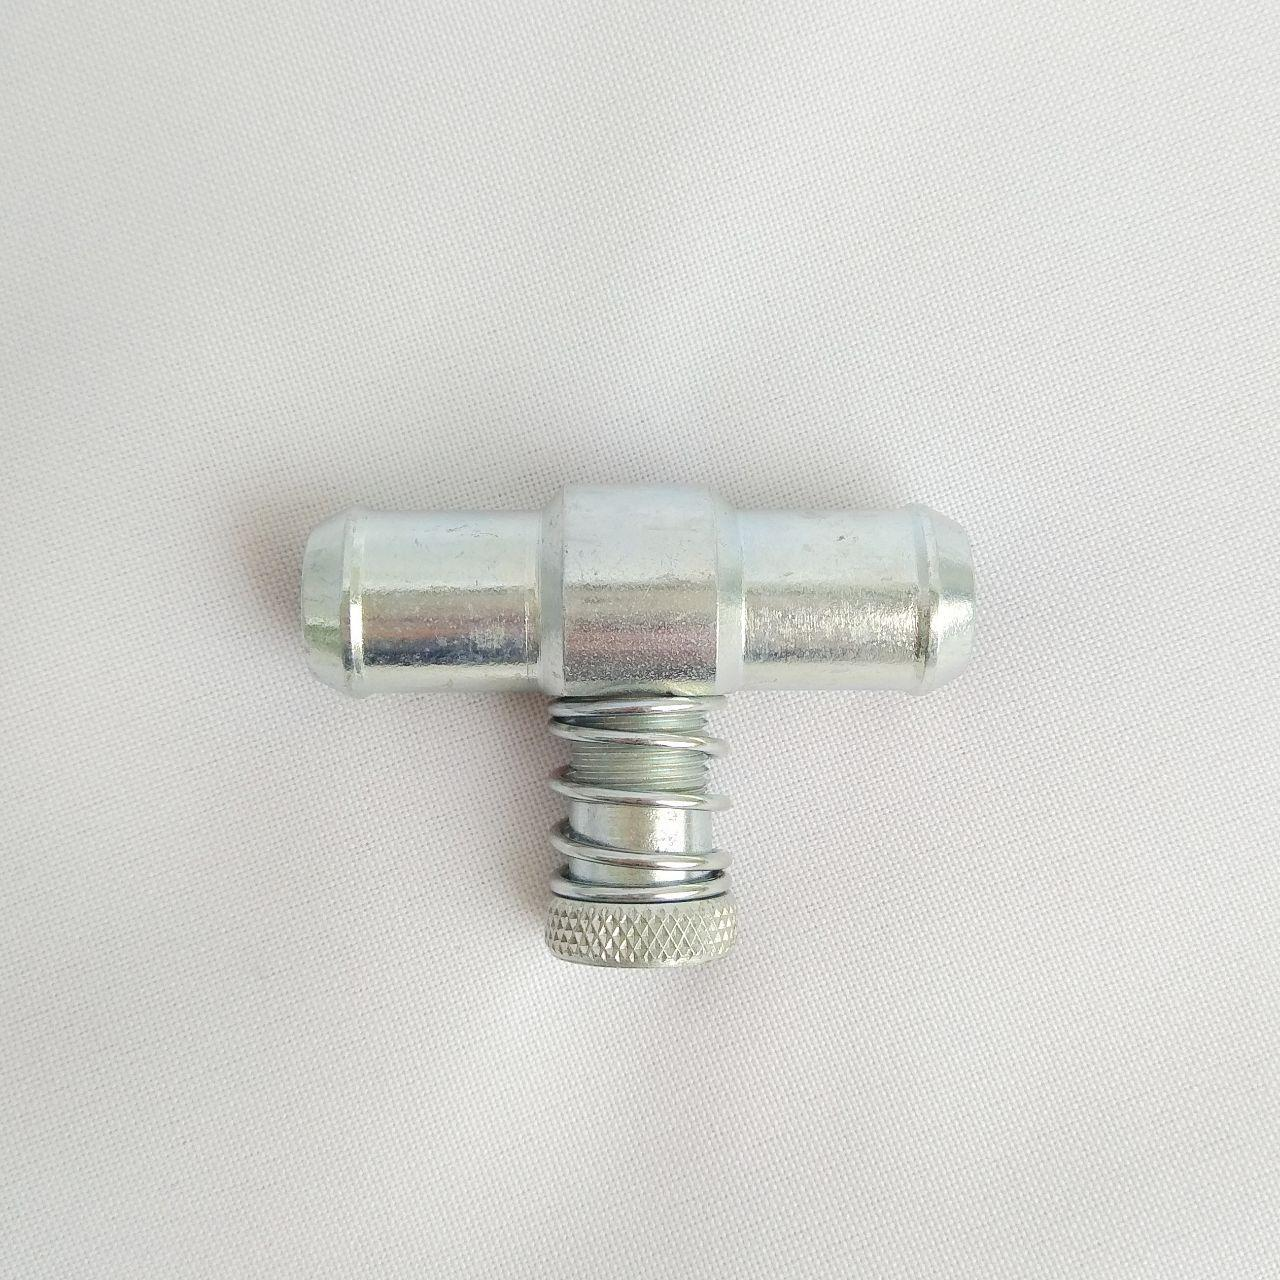 Регистр мощности Atiker 16х16 мм(металл)